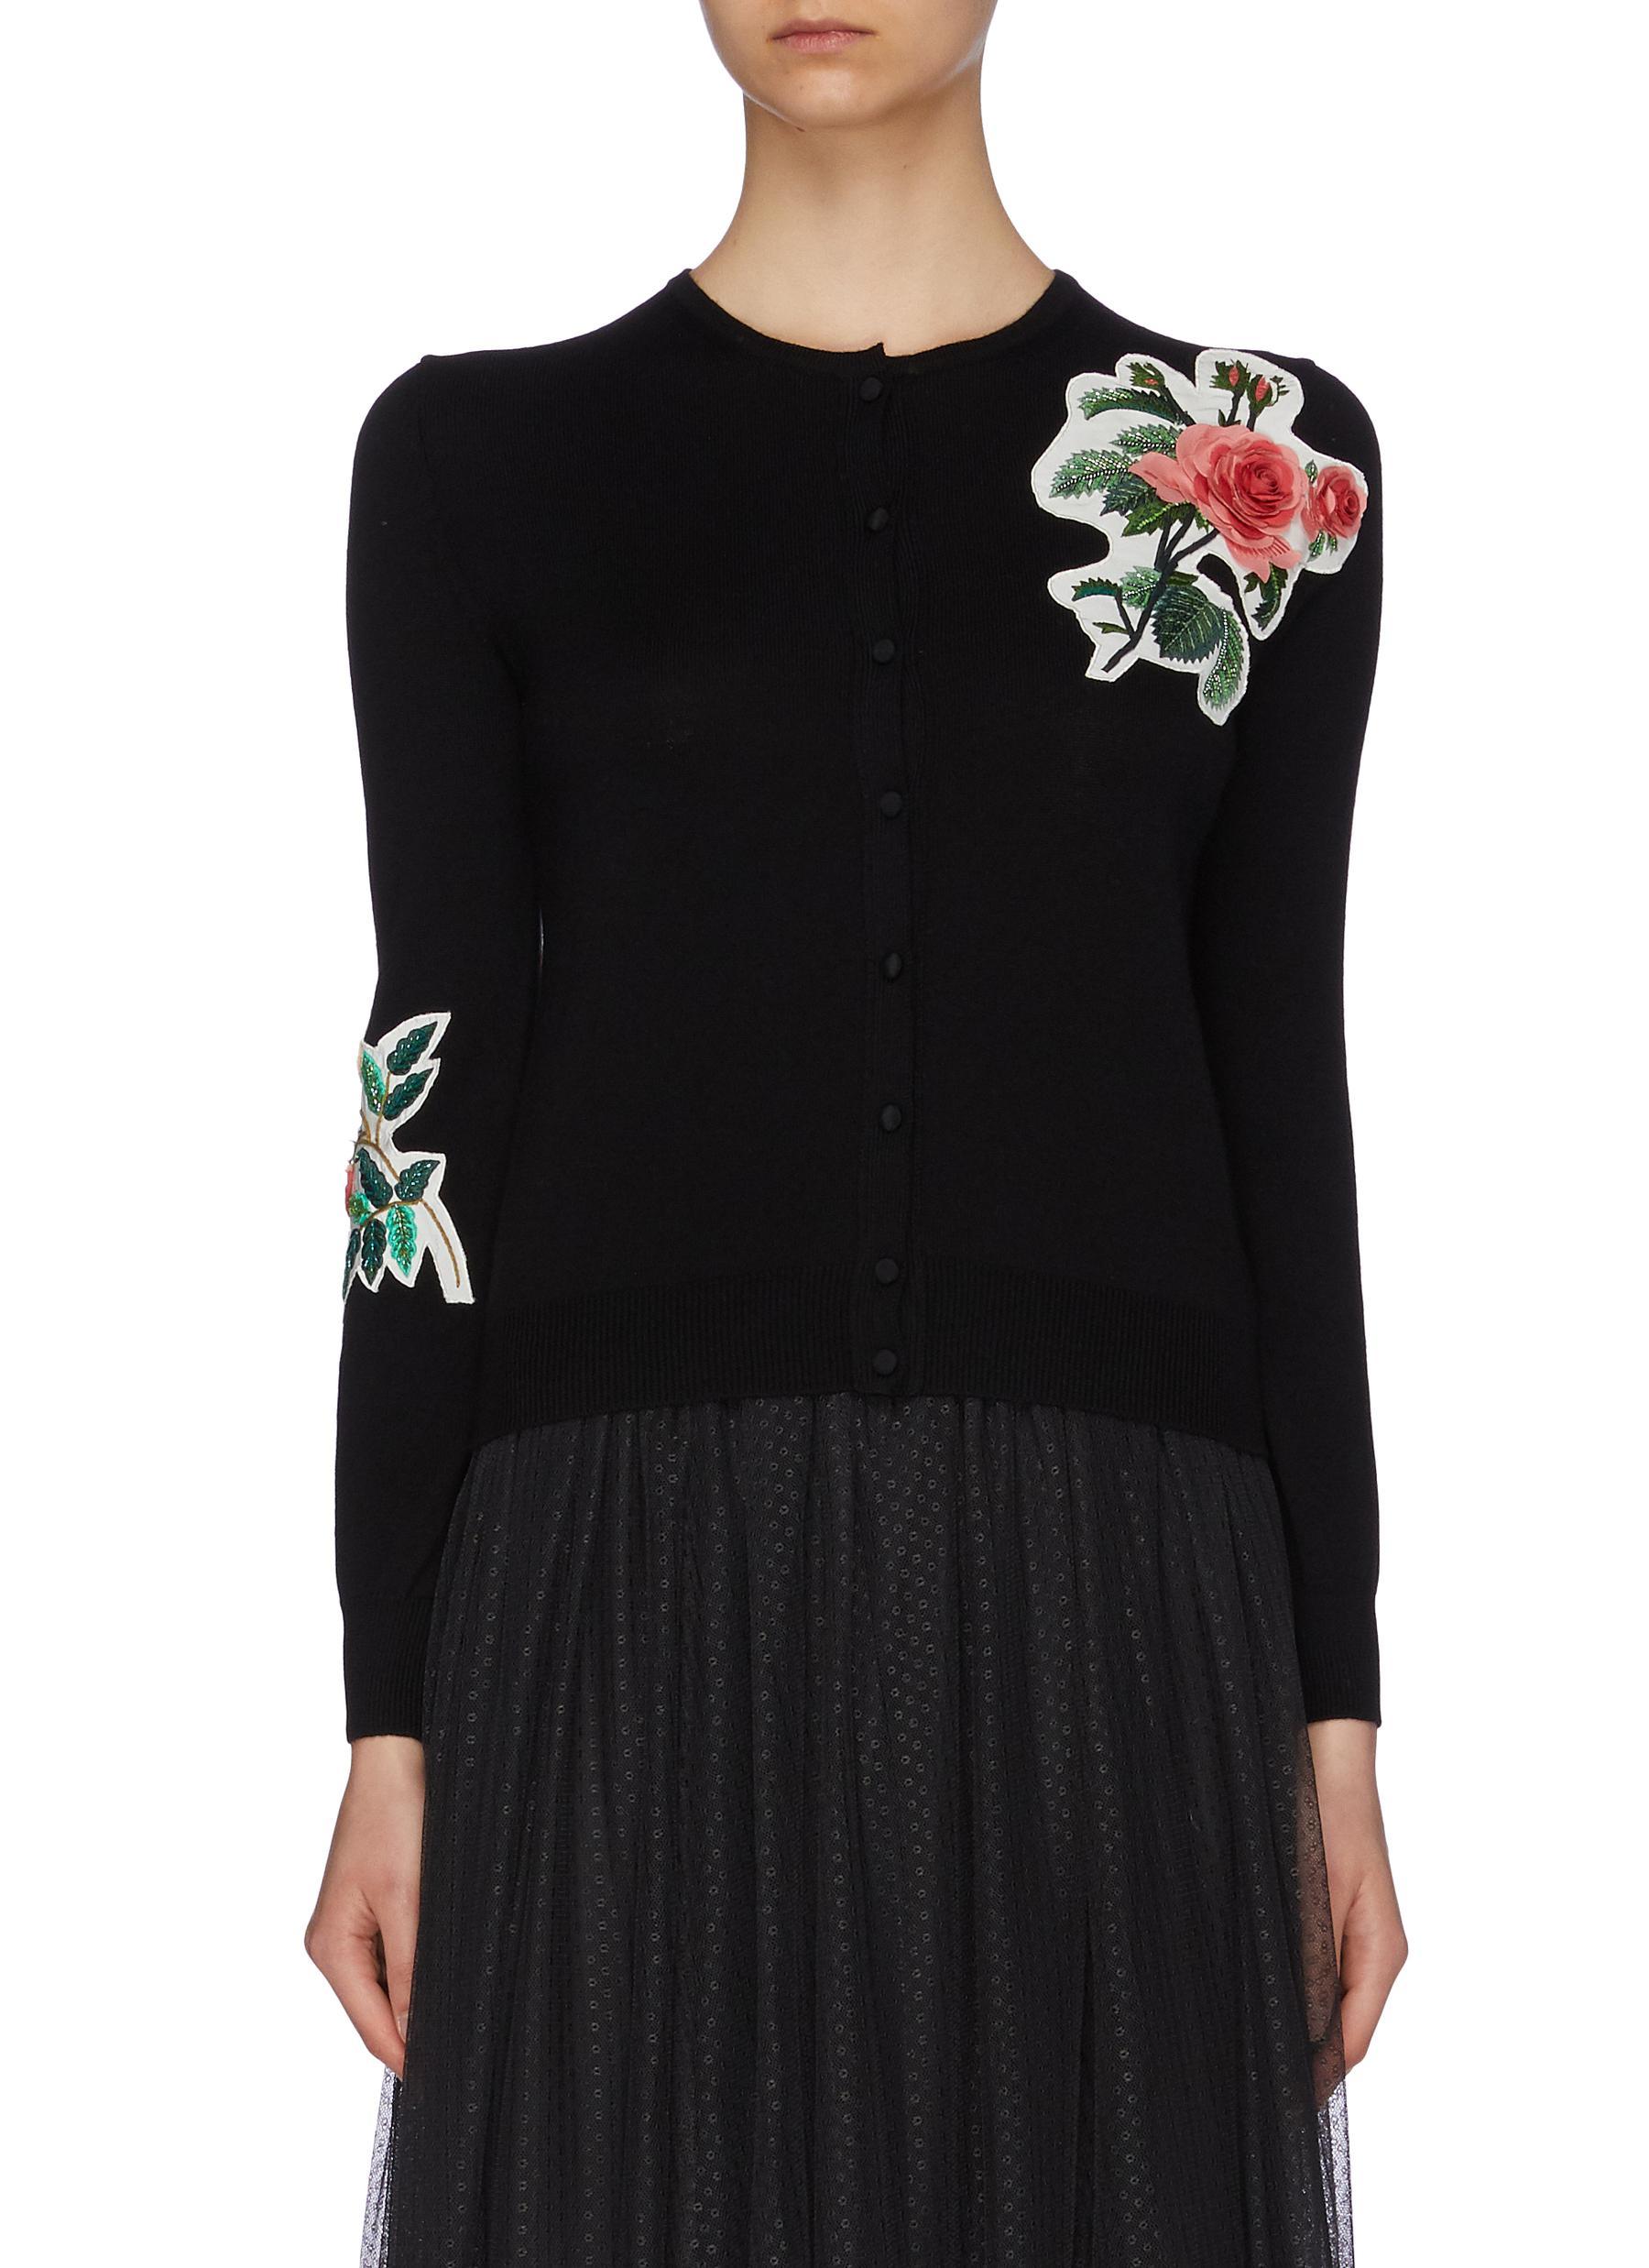 Embellished floral patch Merino wool cardigan by Oscar De La Renta